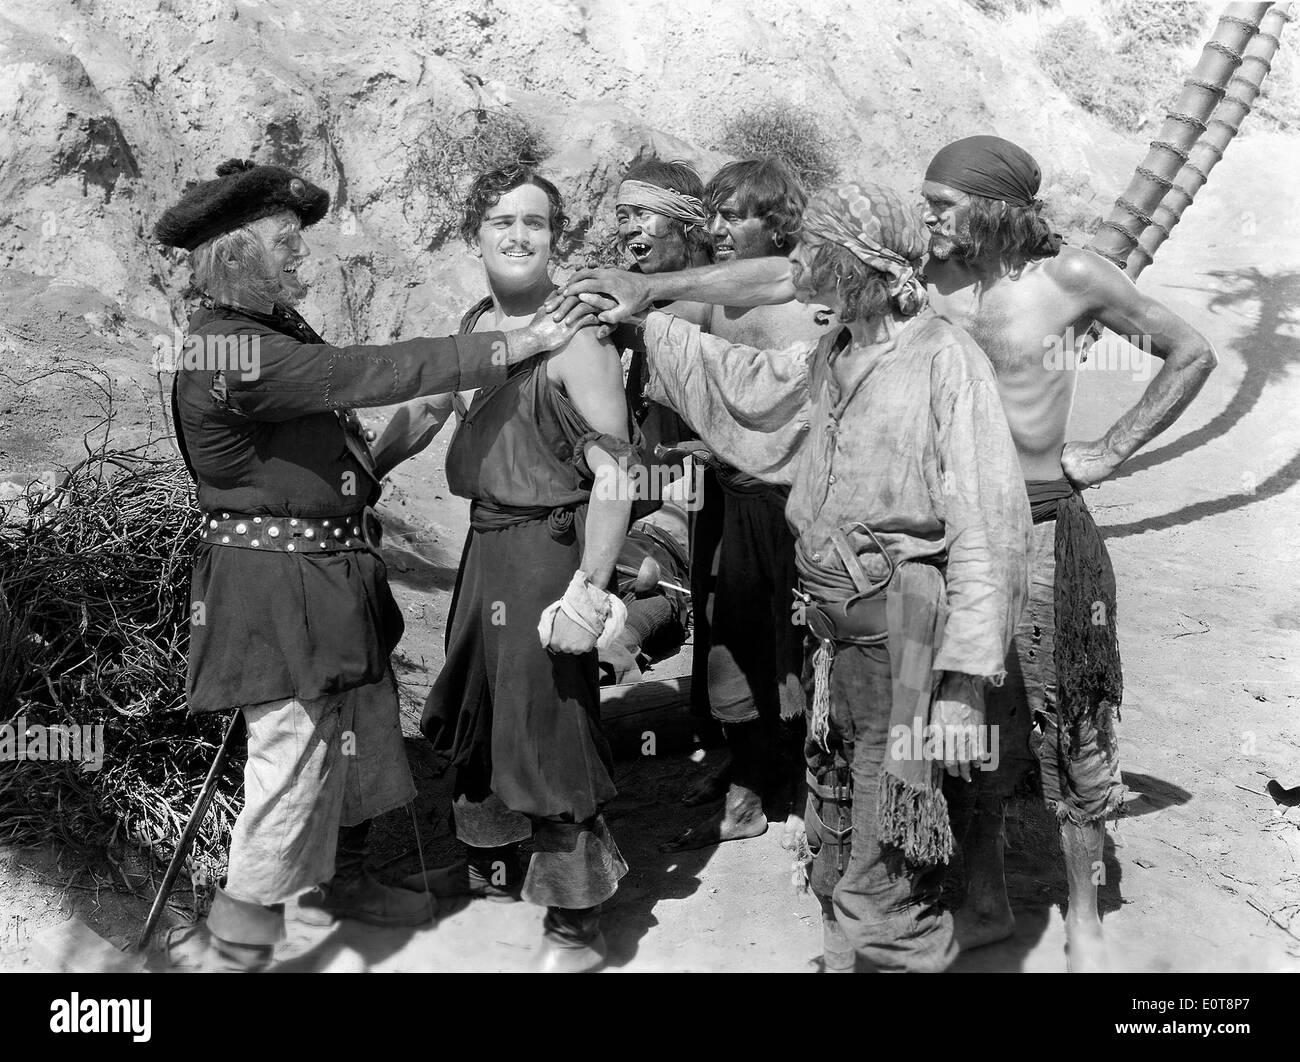 Donald Crisp, (left), Douglas Fairbanks, on-set of the Film, 'The Black Pirate', 1926 - Stock Image